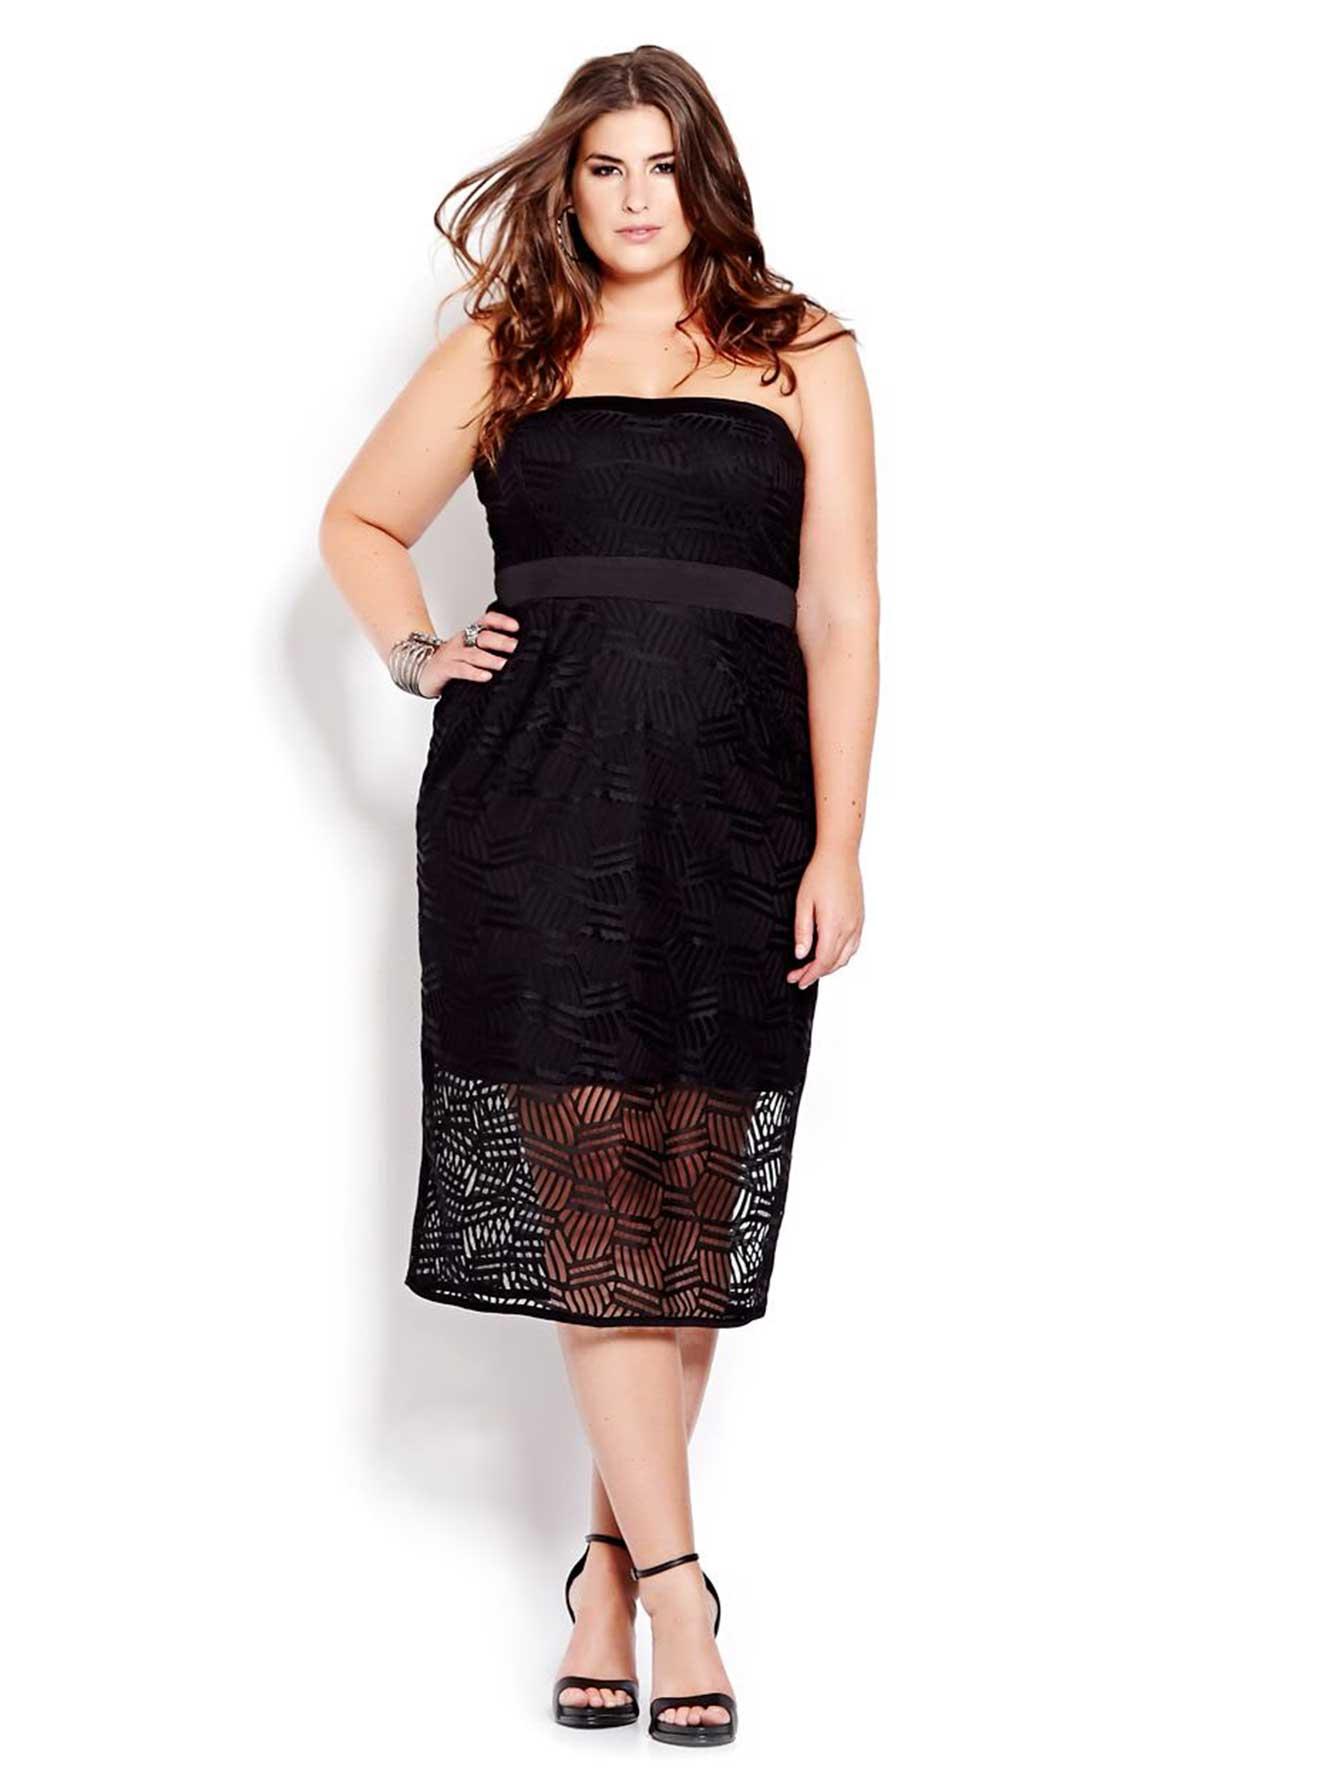 New Noir Geo Lace Strapless Dress Addition Elle